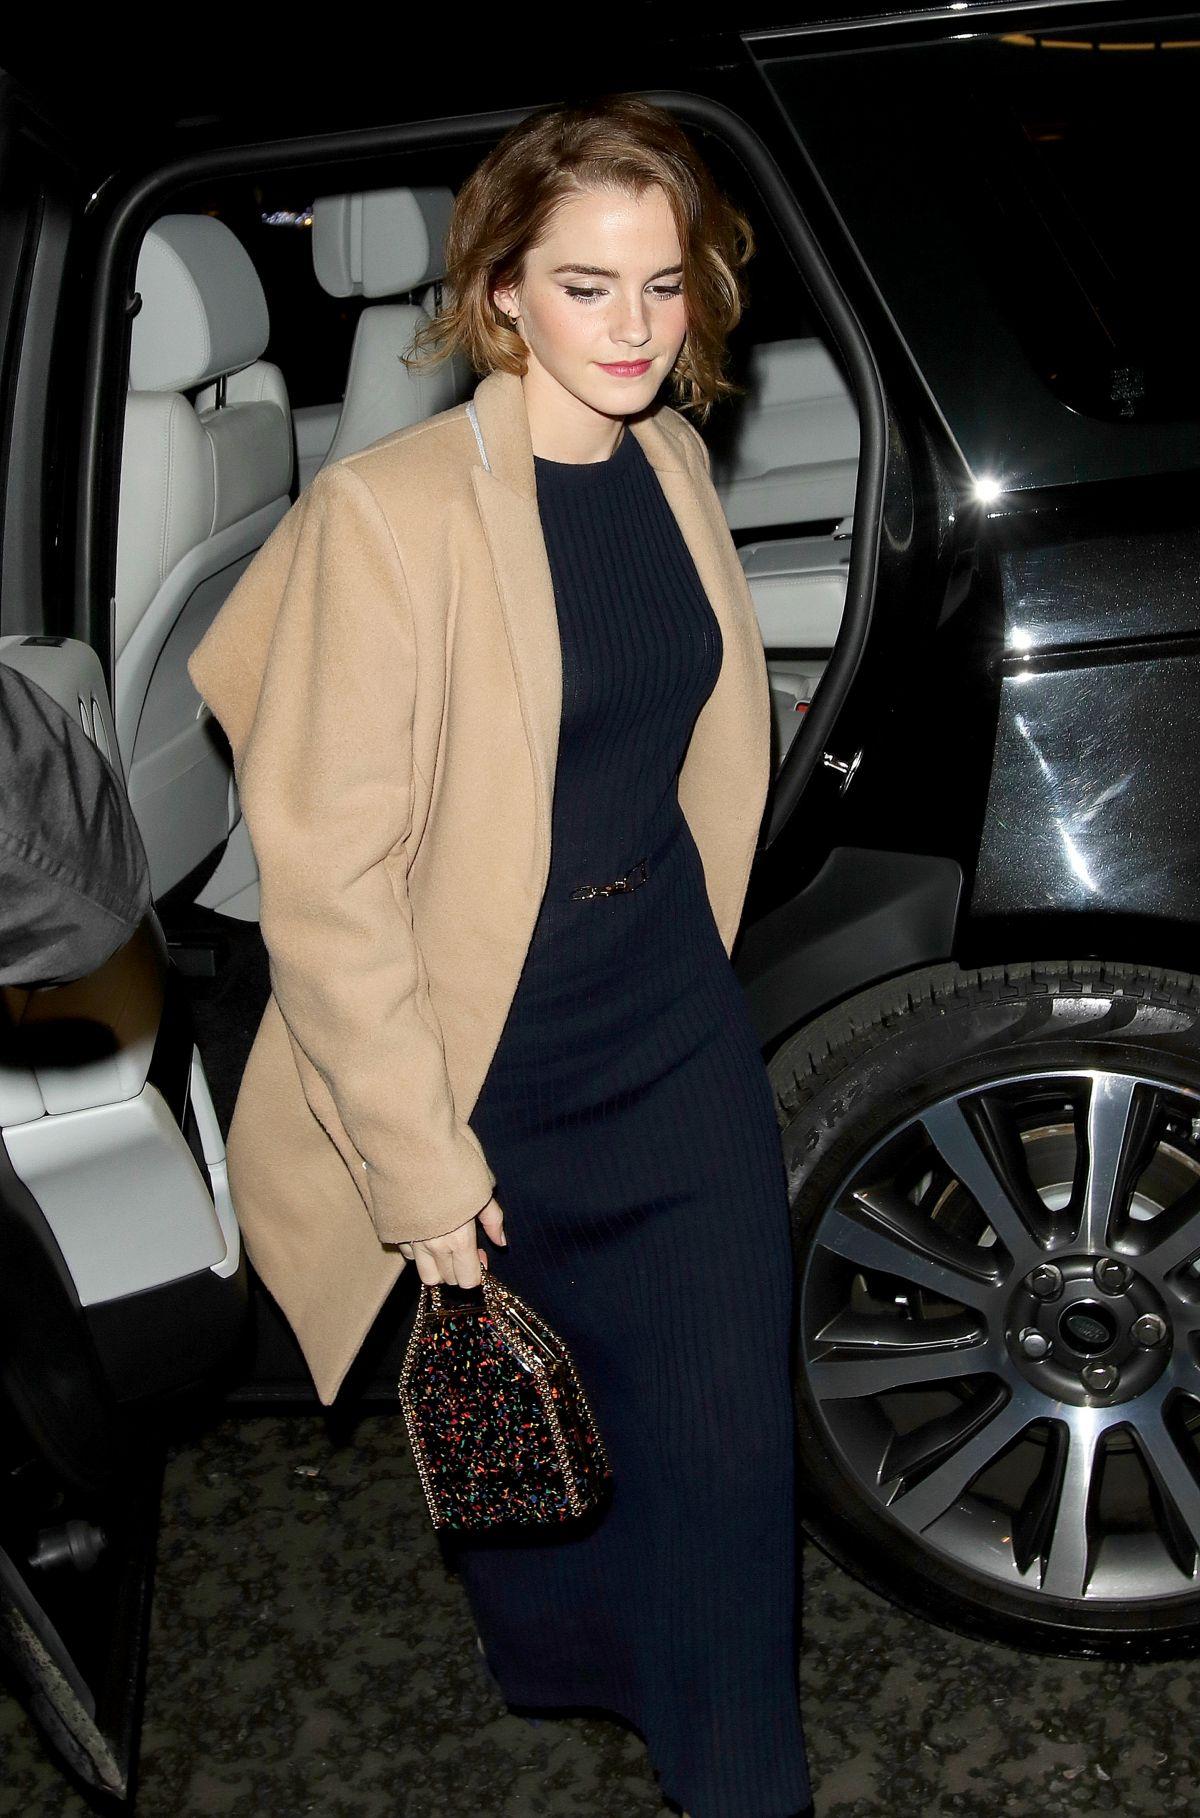 Emma Watson At The True Cost Screenig In London 12 08 2015